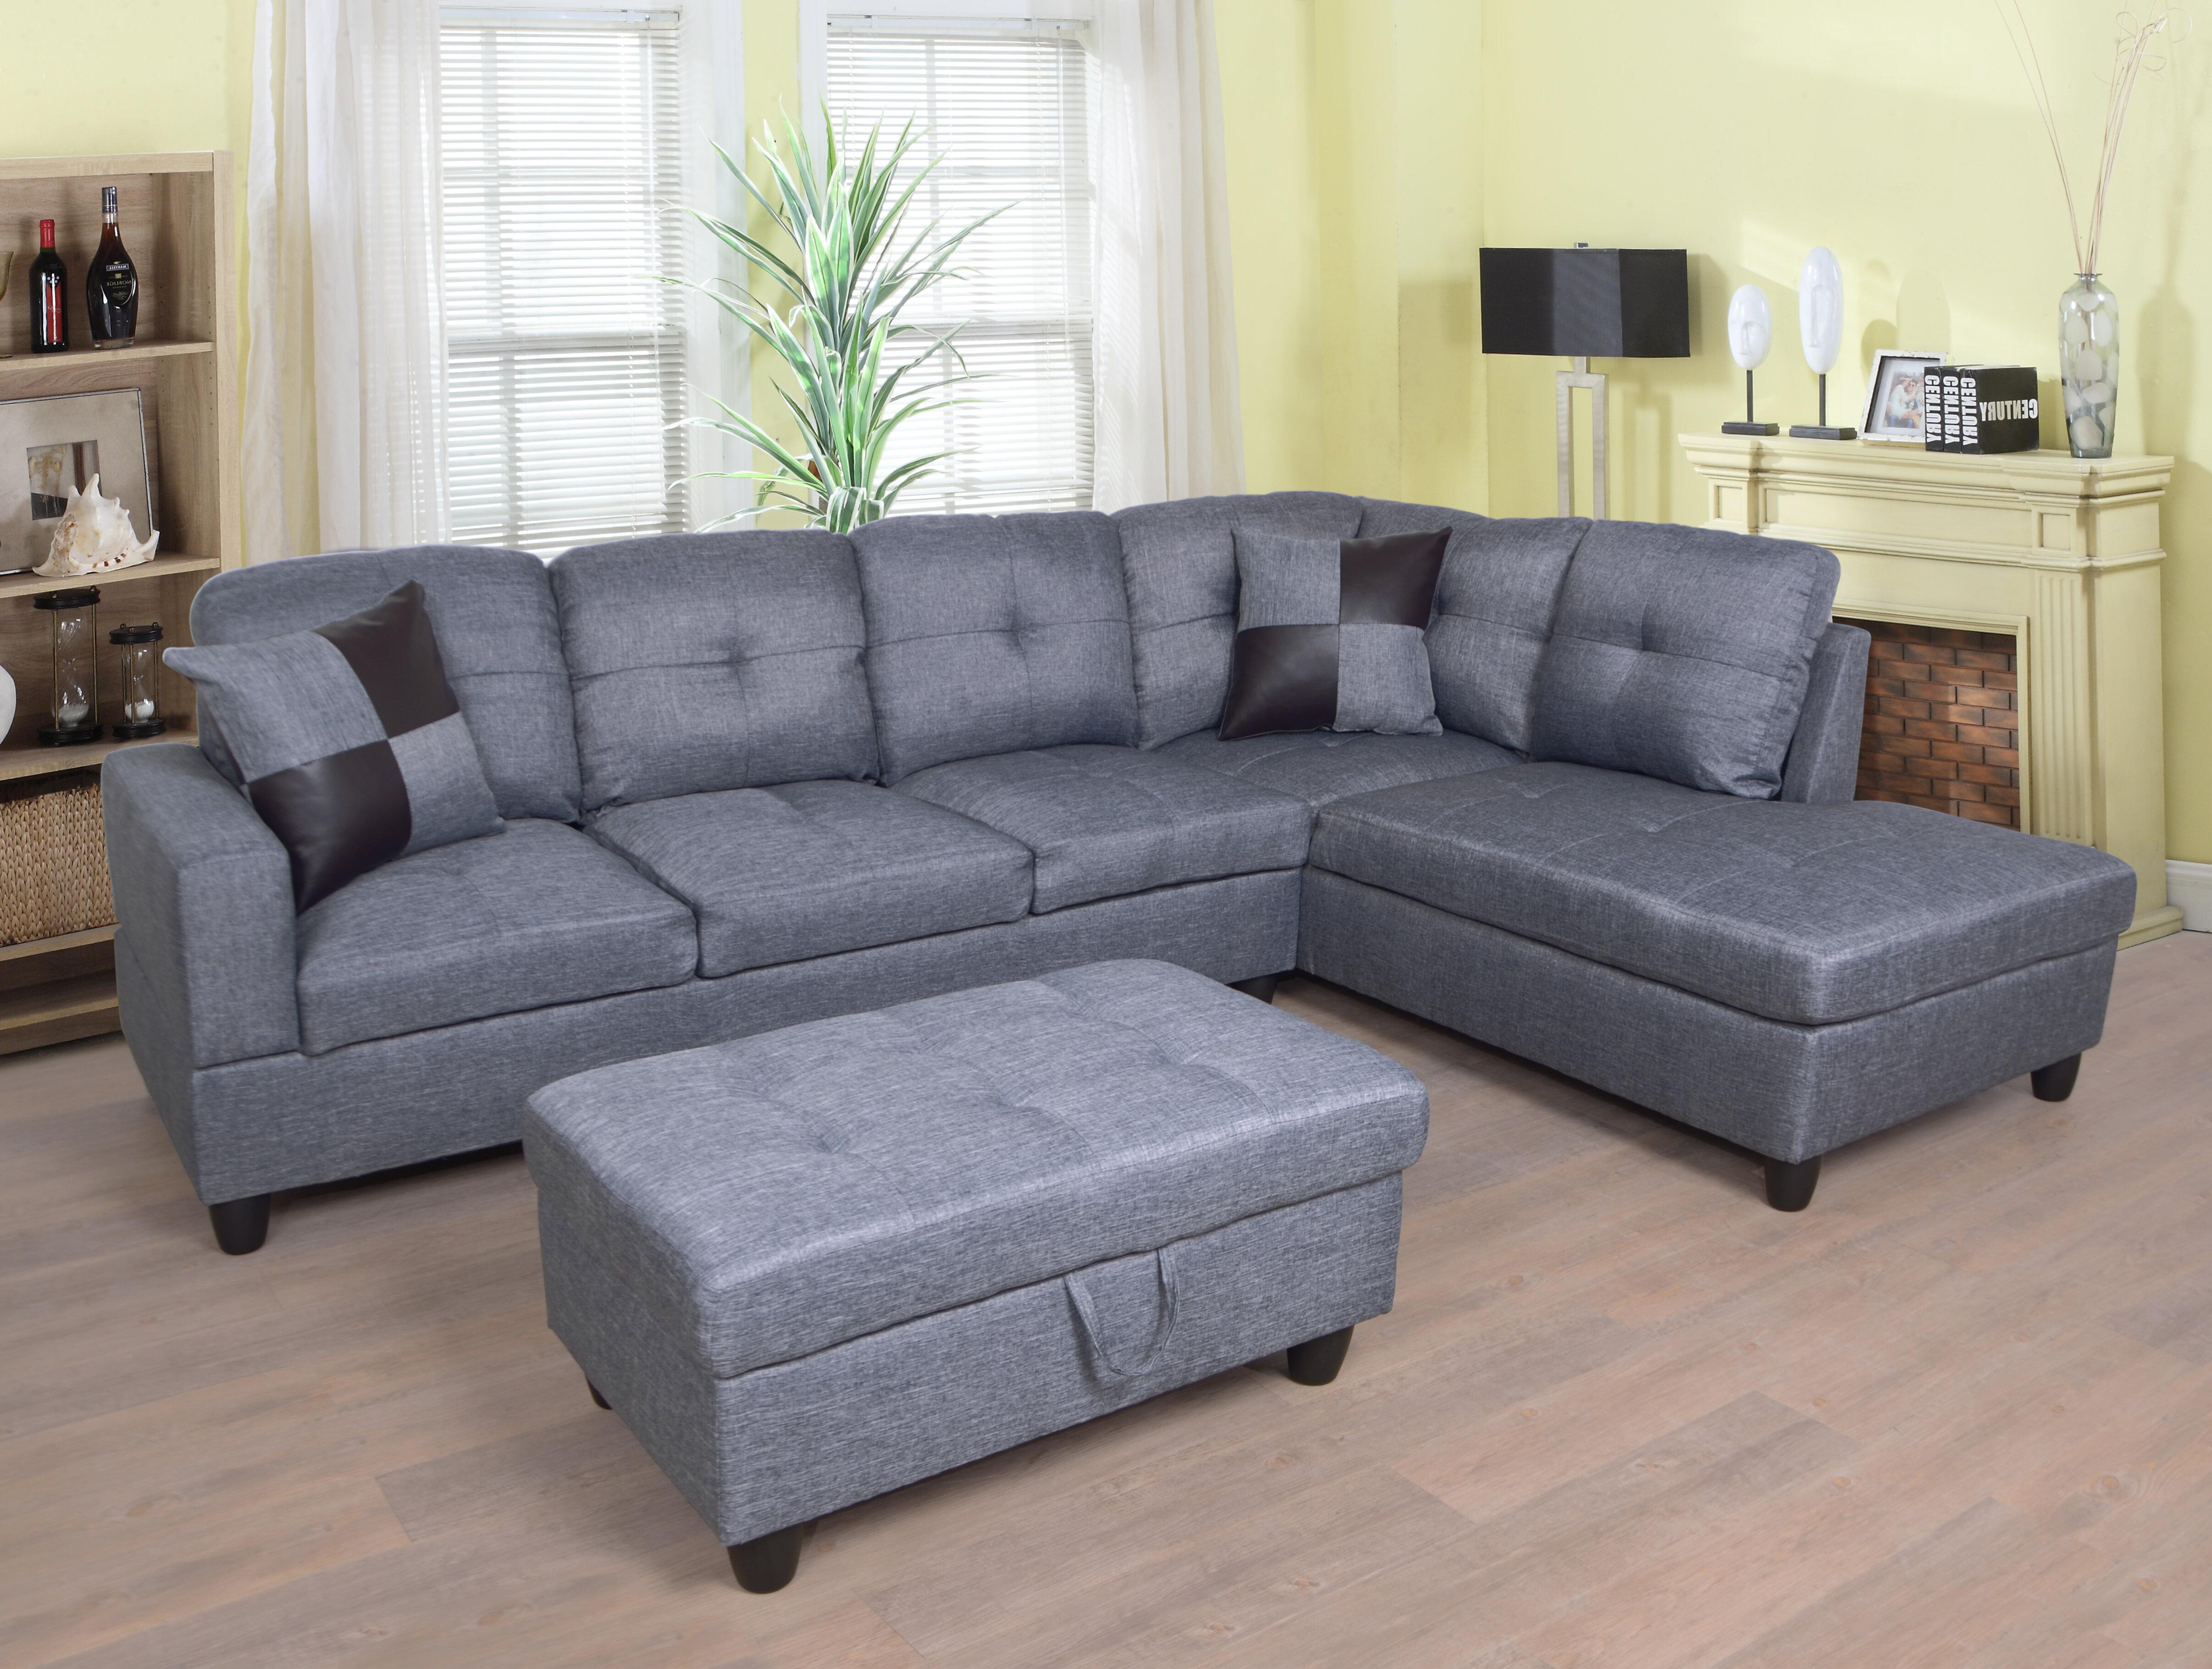 Ebern Designs Mendoza 103 5 Wide Right Hand Facing Sofa Chaise With Ottoman Reviews Wayfair